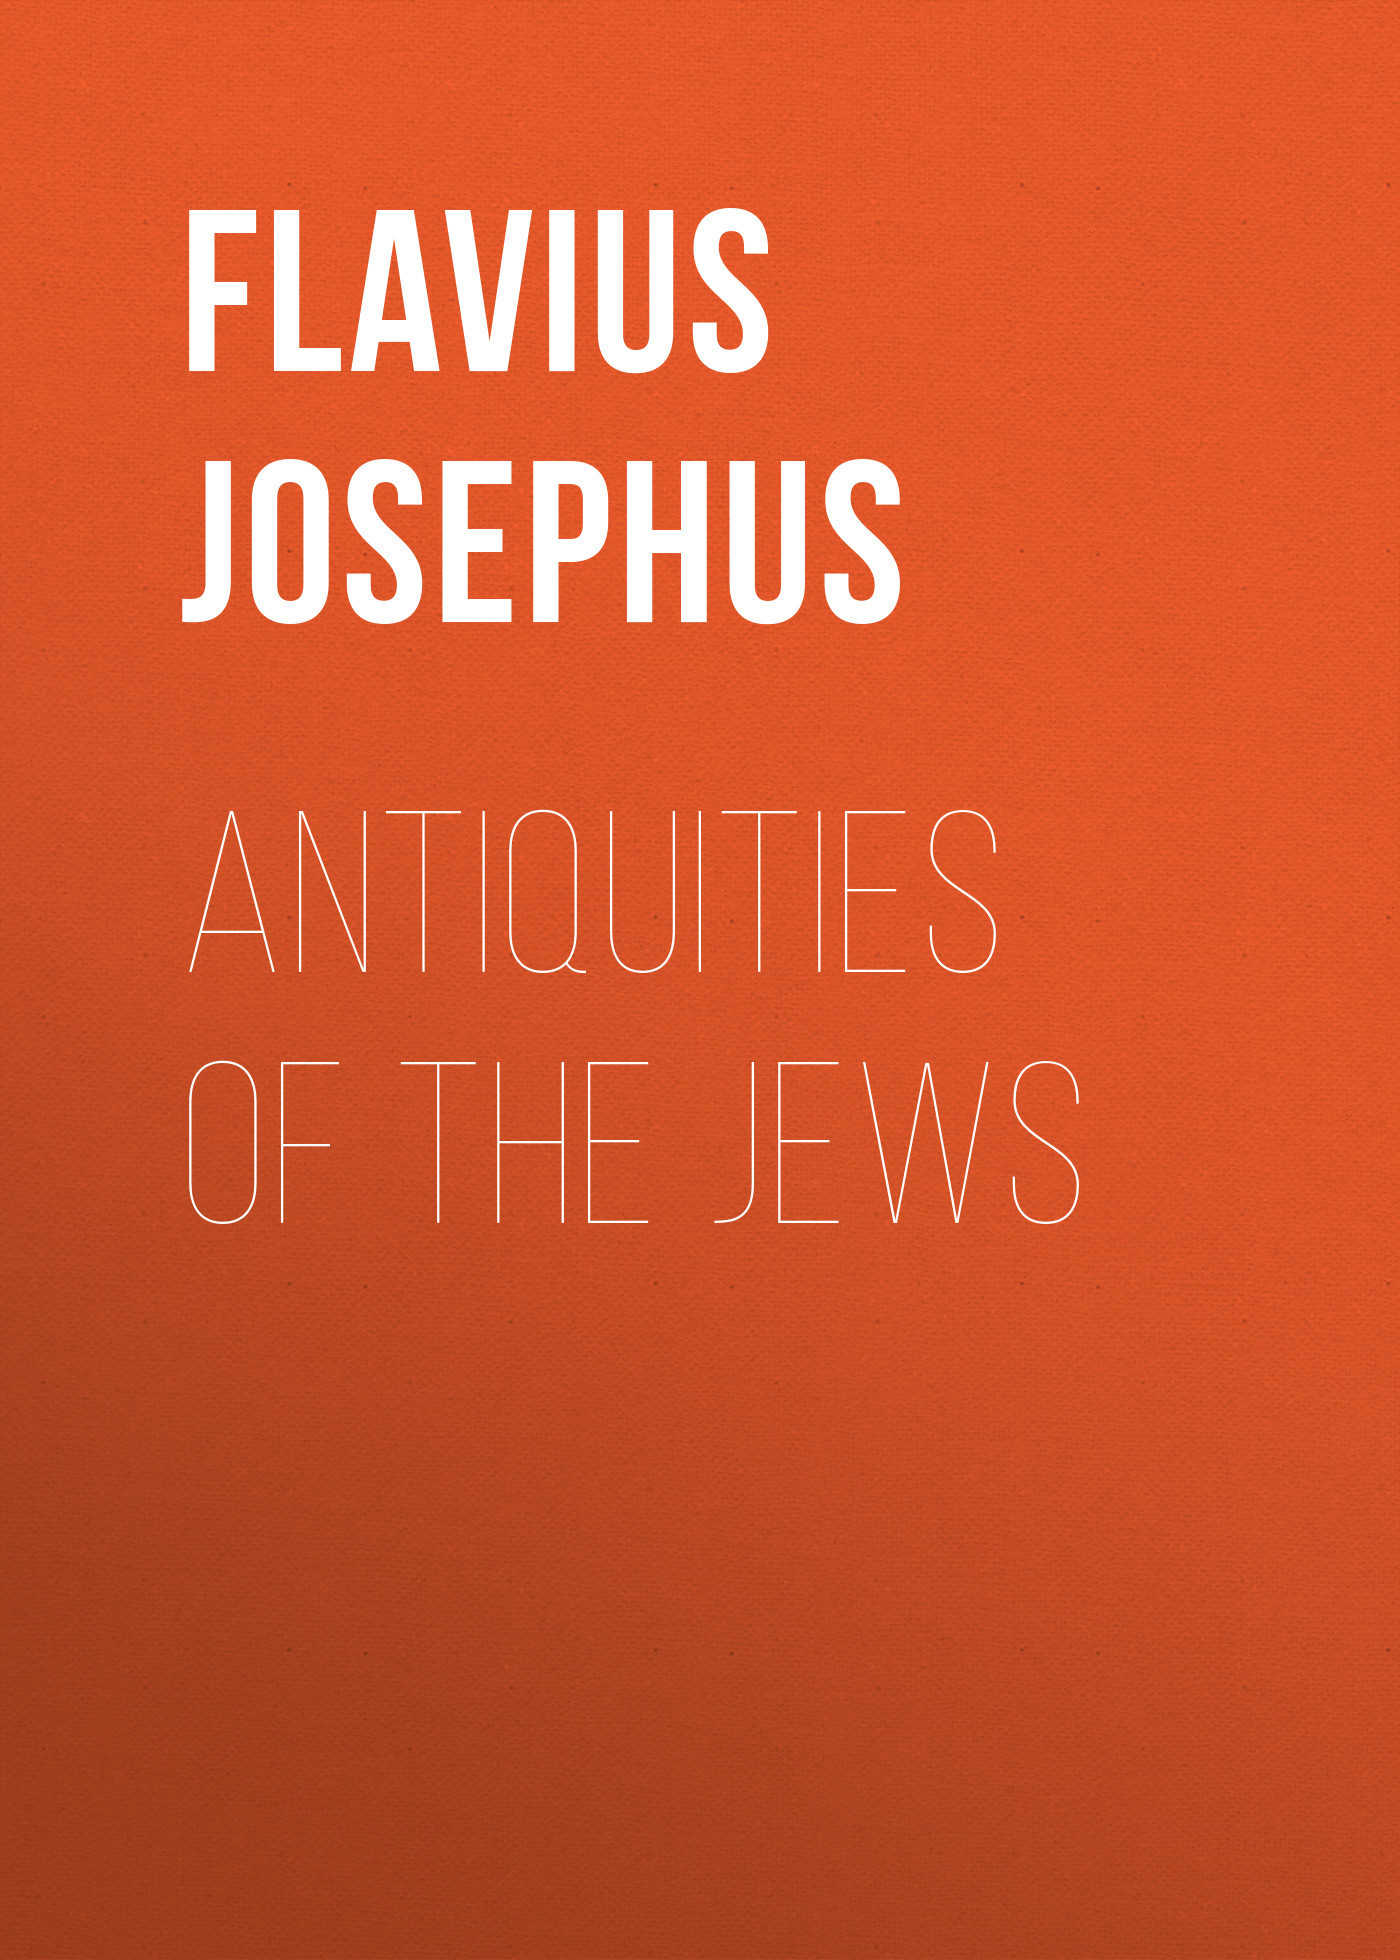 Flavius Josephus Antiquities of the Jews canarsie – the jews